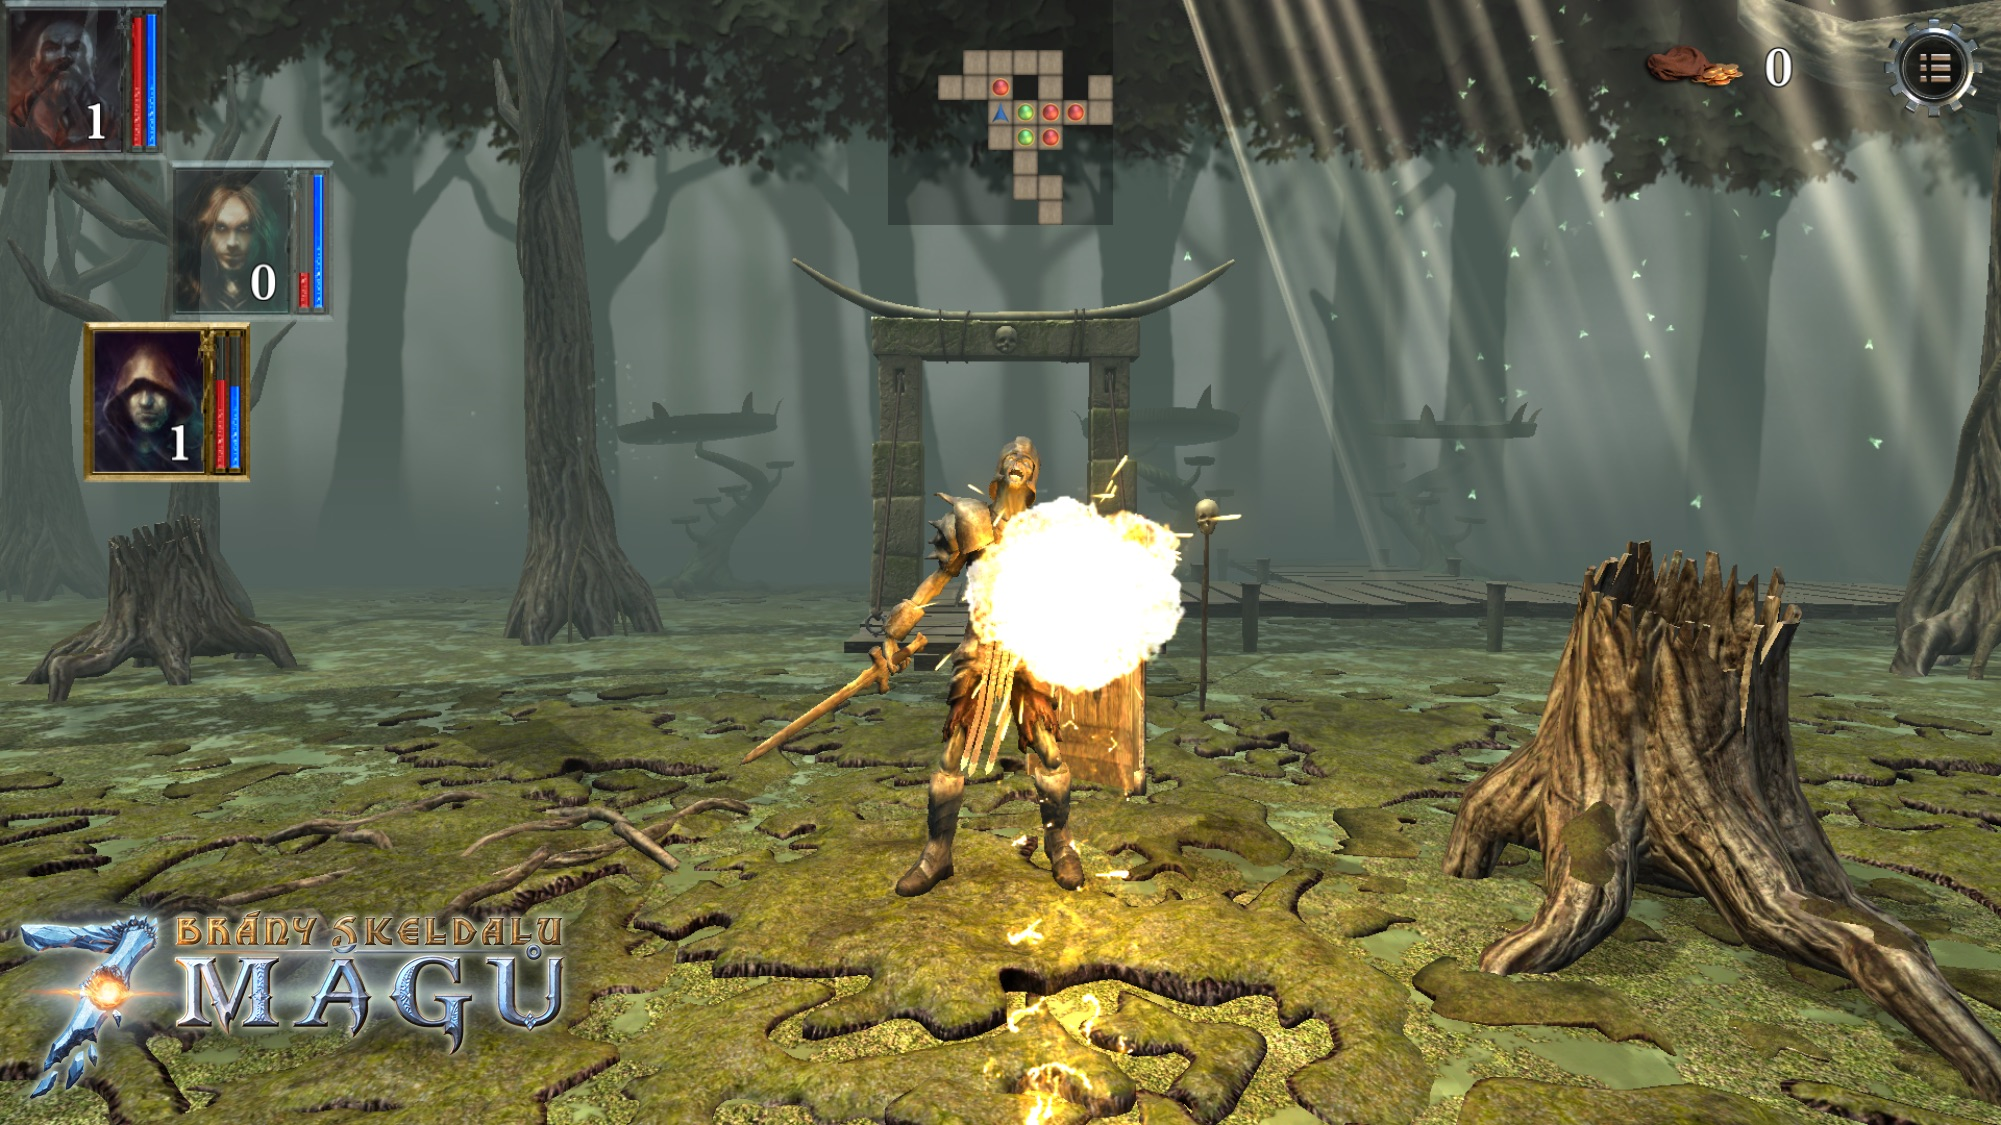 Brány Skeldalu 3: Sedm mágů v prvním gameplay videu 109266